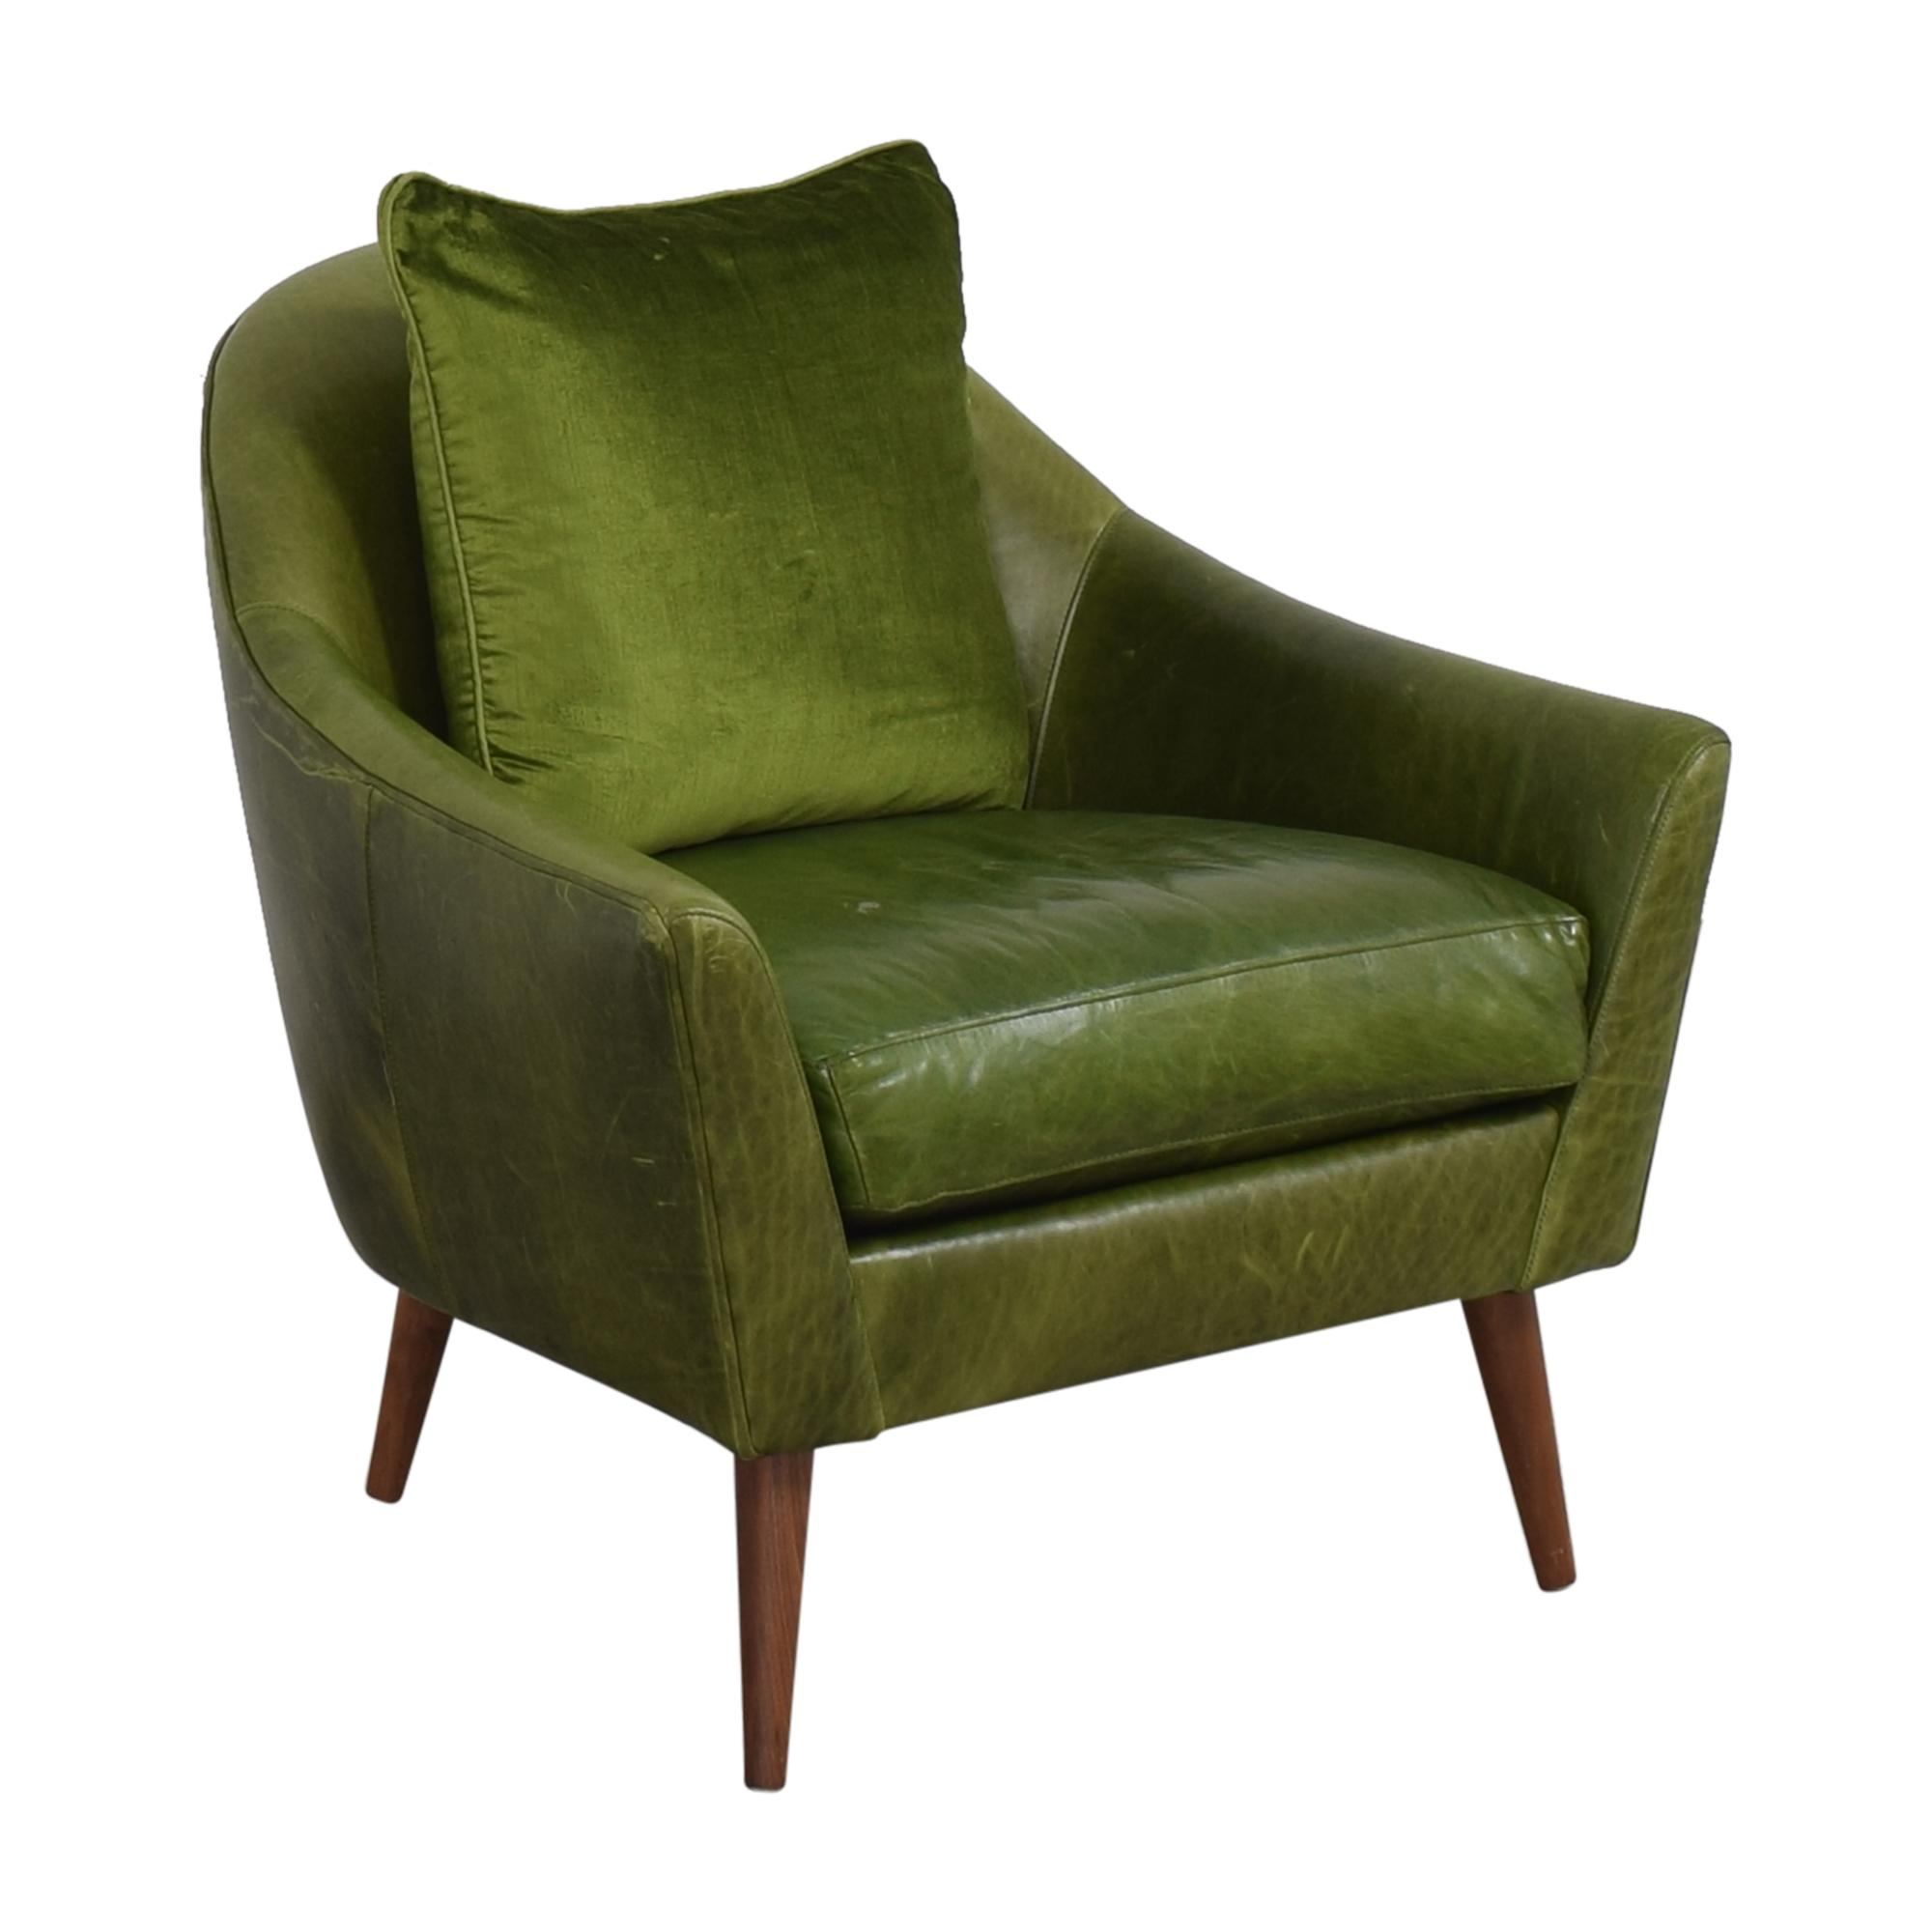 Crate & Barrel Crate & Barrel Modern Accent Chair ct